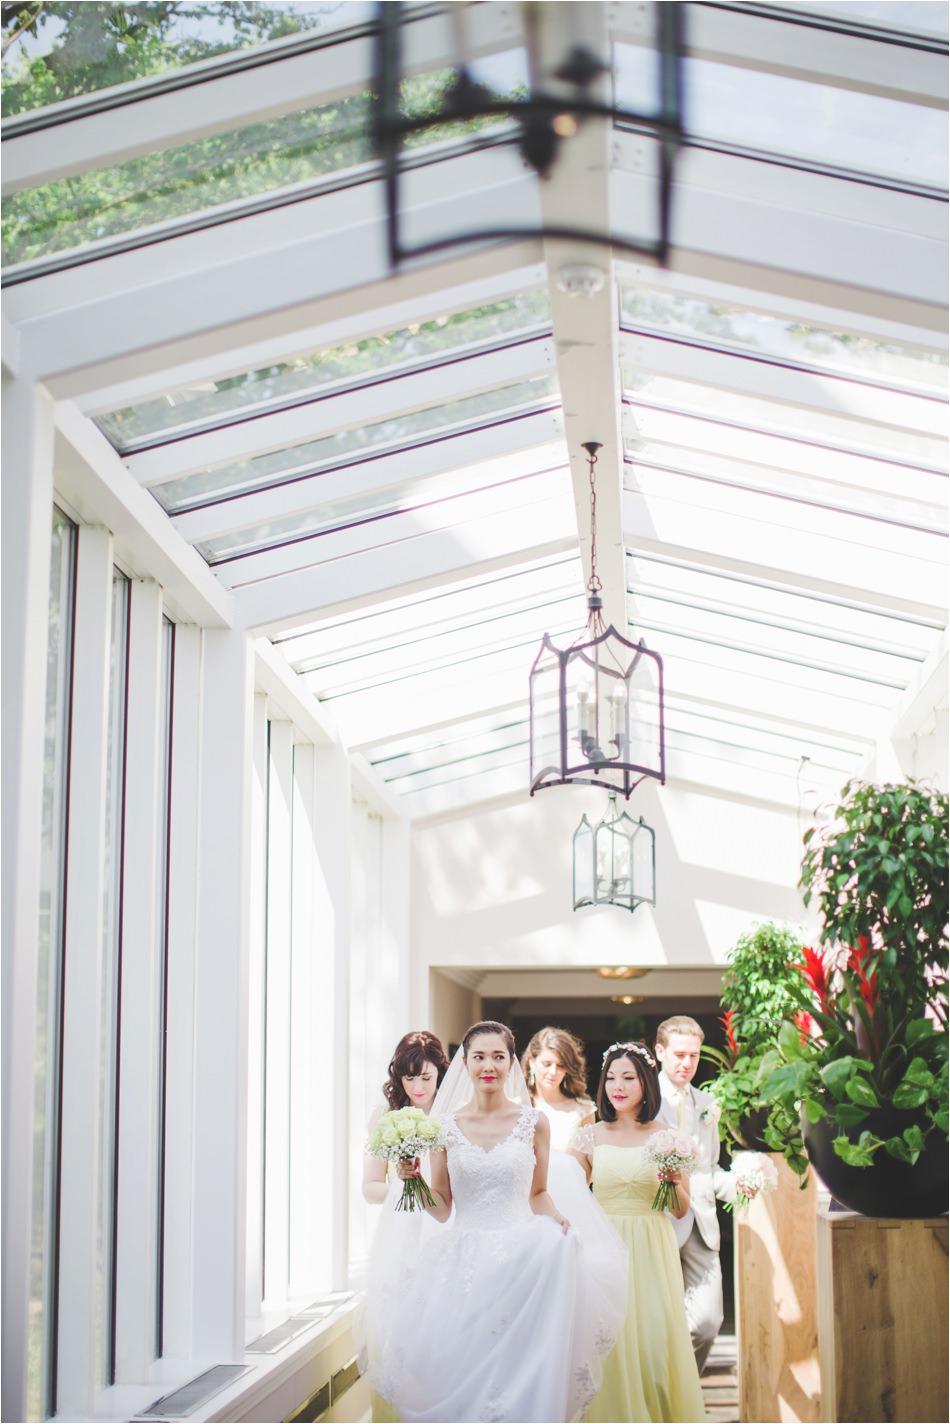 fine art wedding photographers scotland glasgow 4-7.jpg